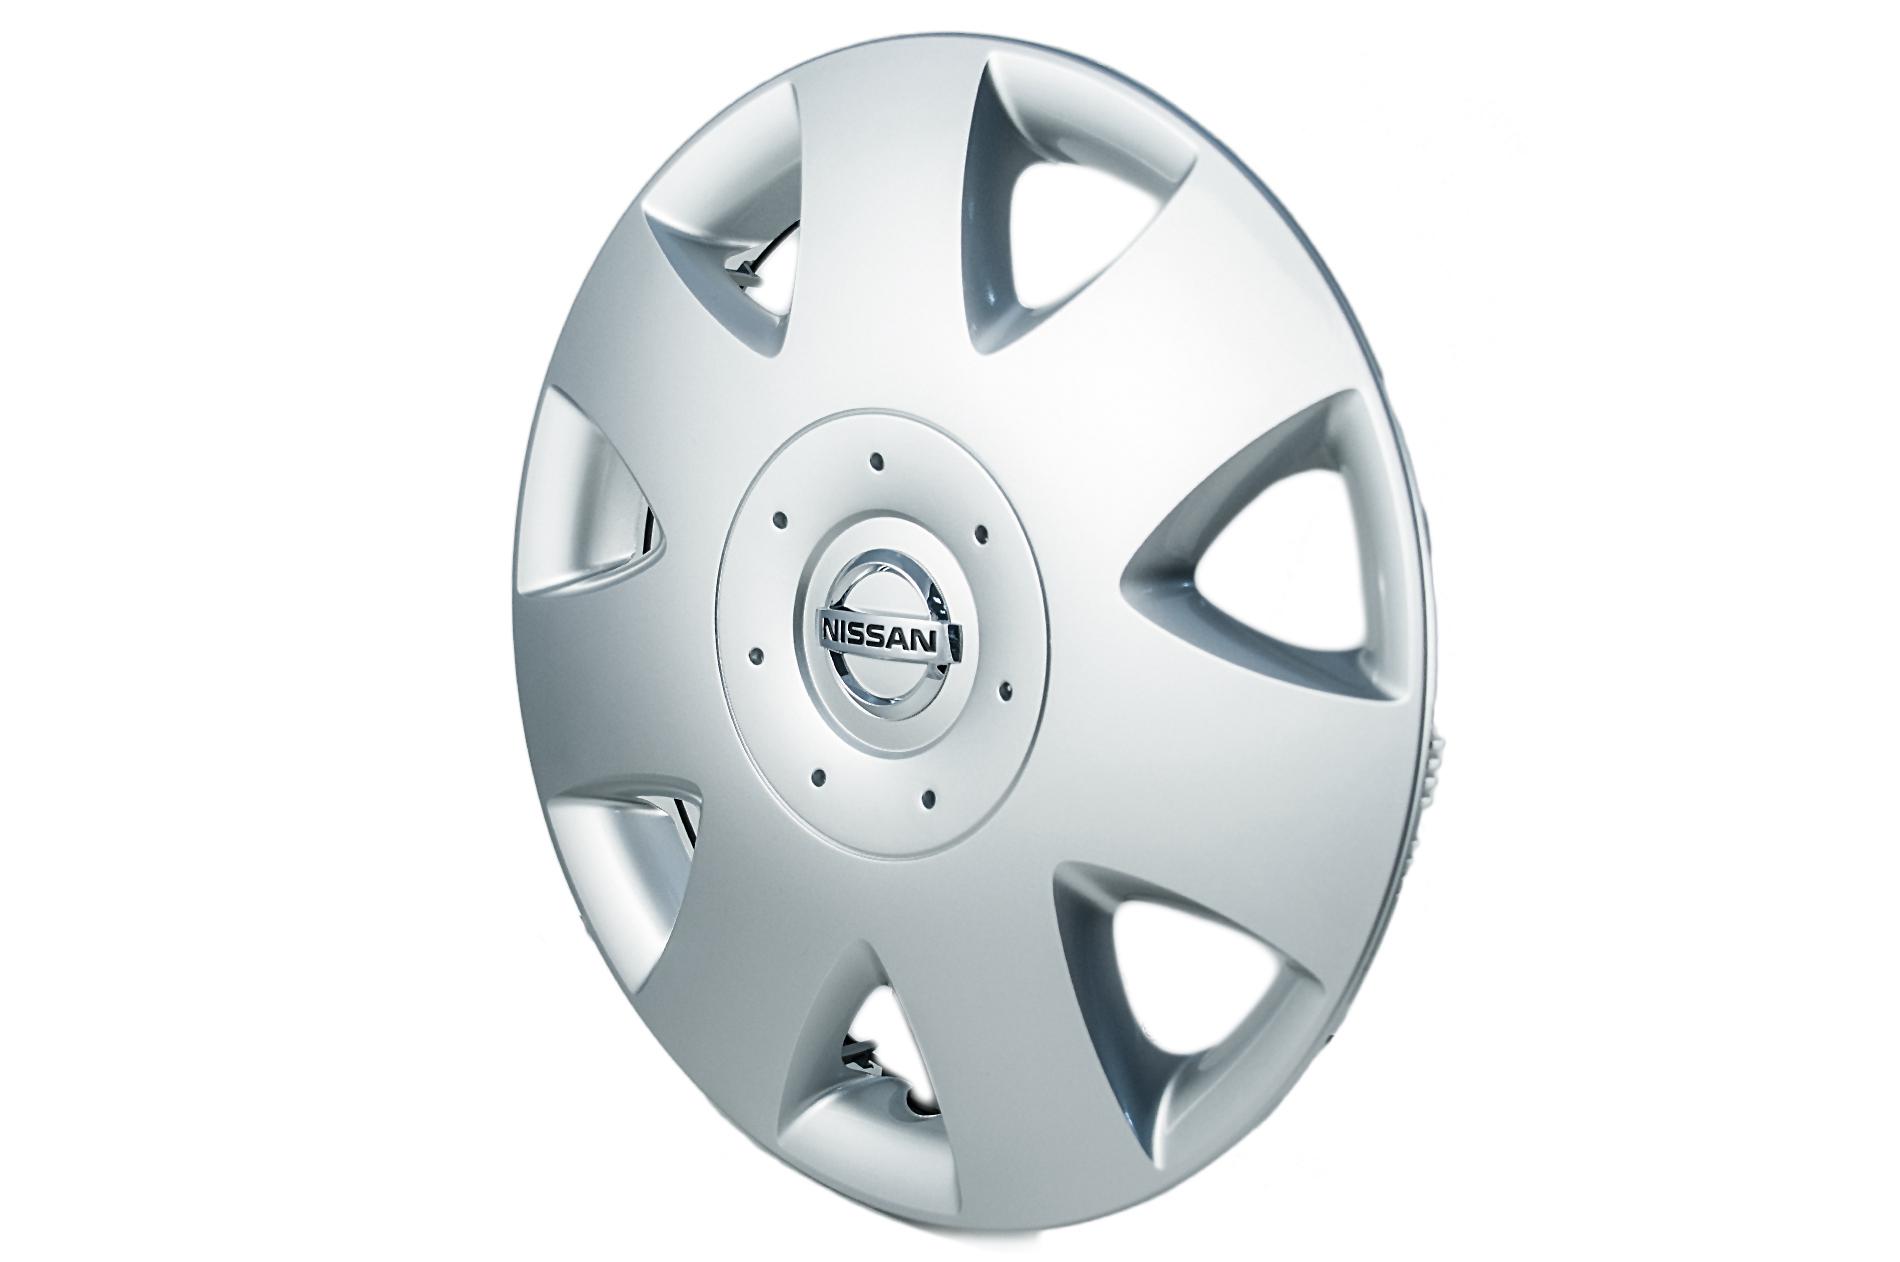 Nissan Genuine Almera N16 Car Hubcap Hub Cap 15 Wheel